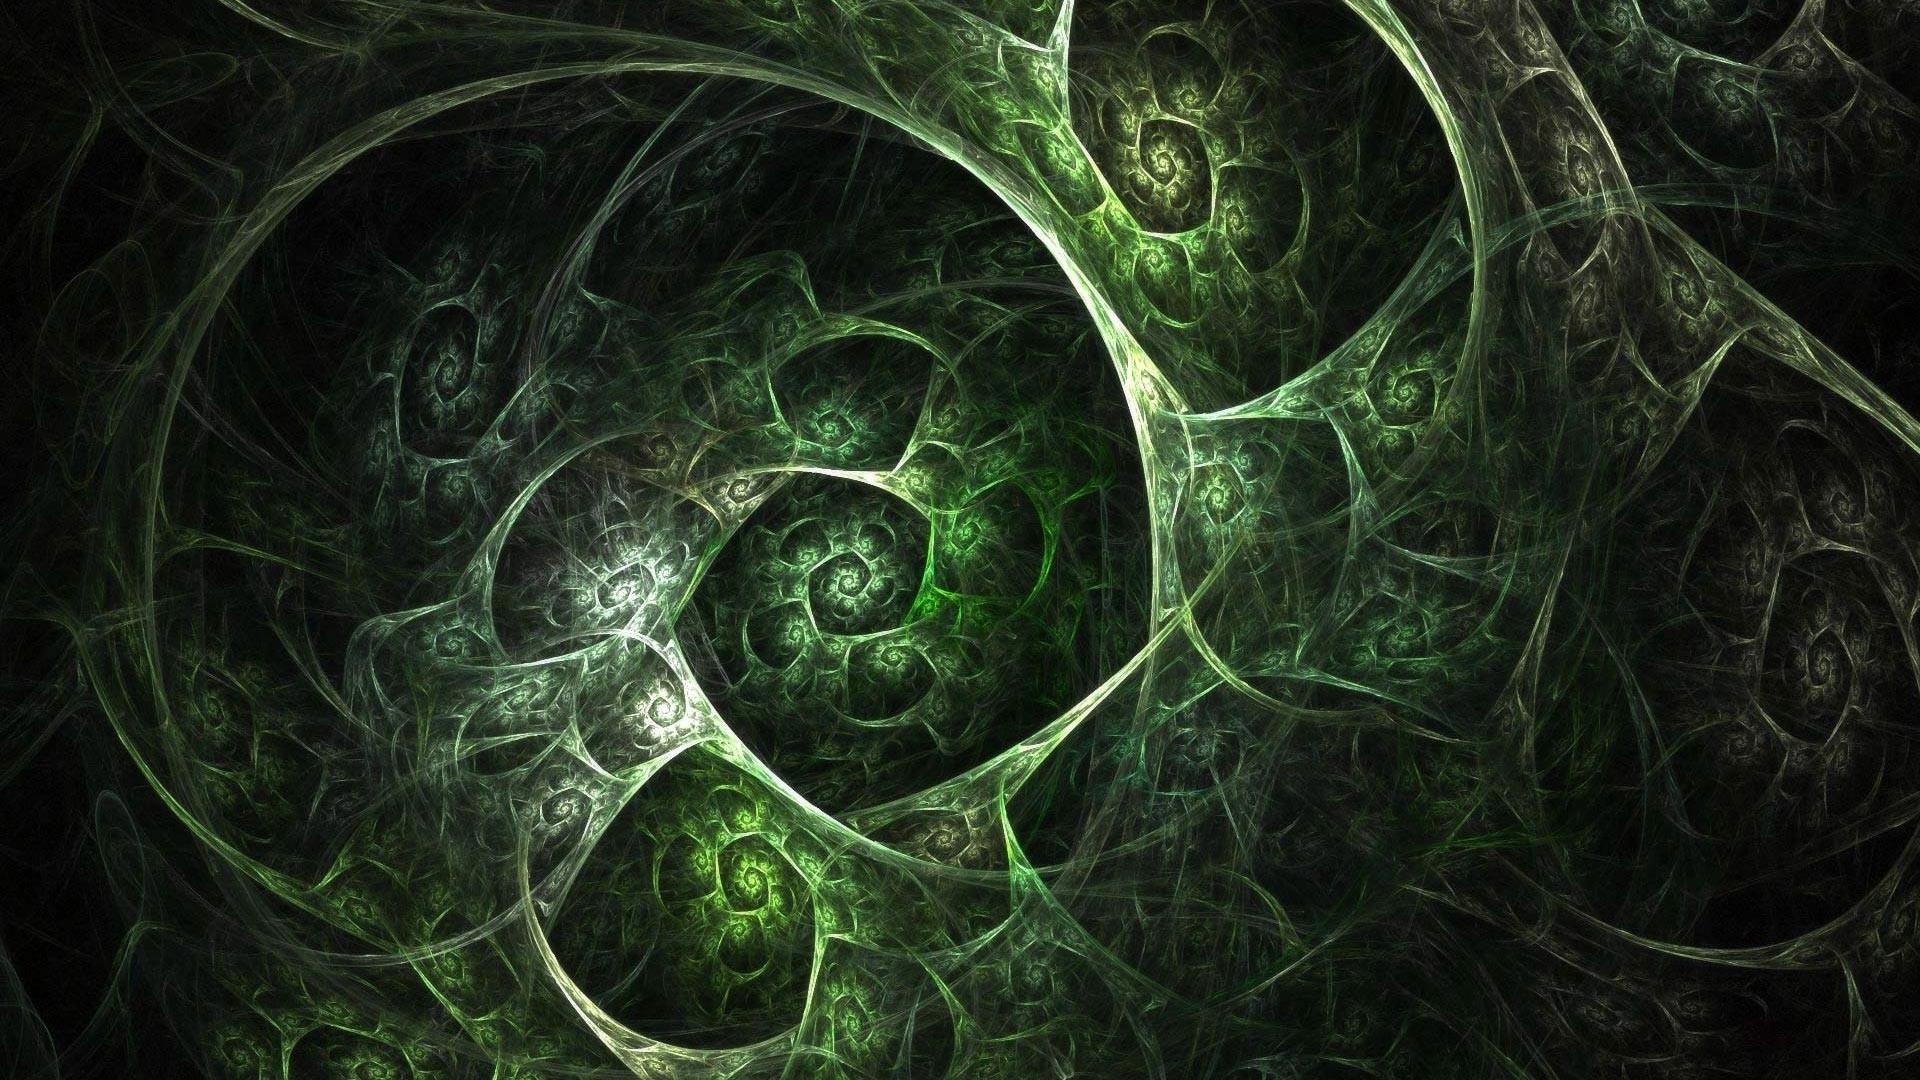 Wallpaper grid, cells, green, black, smoke